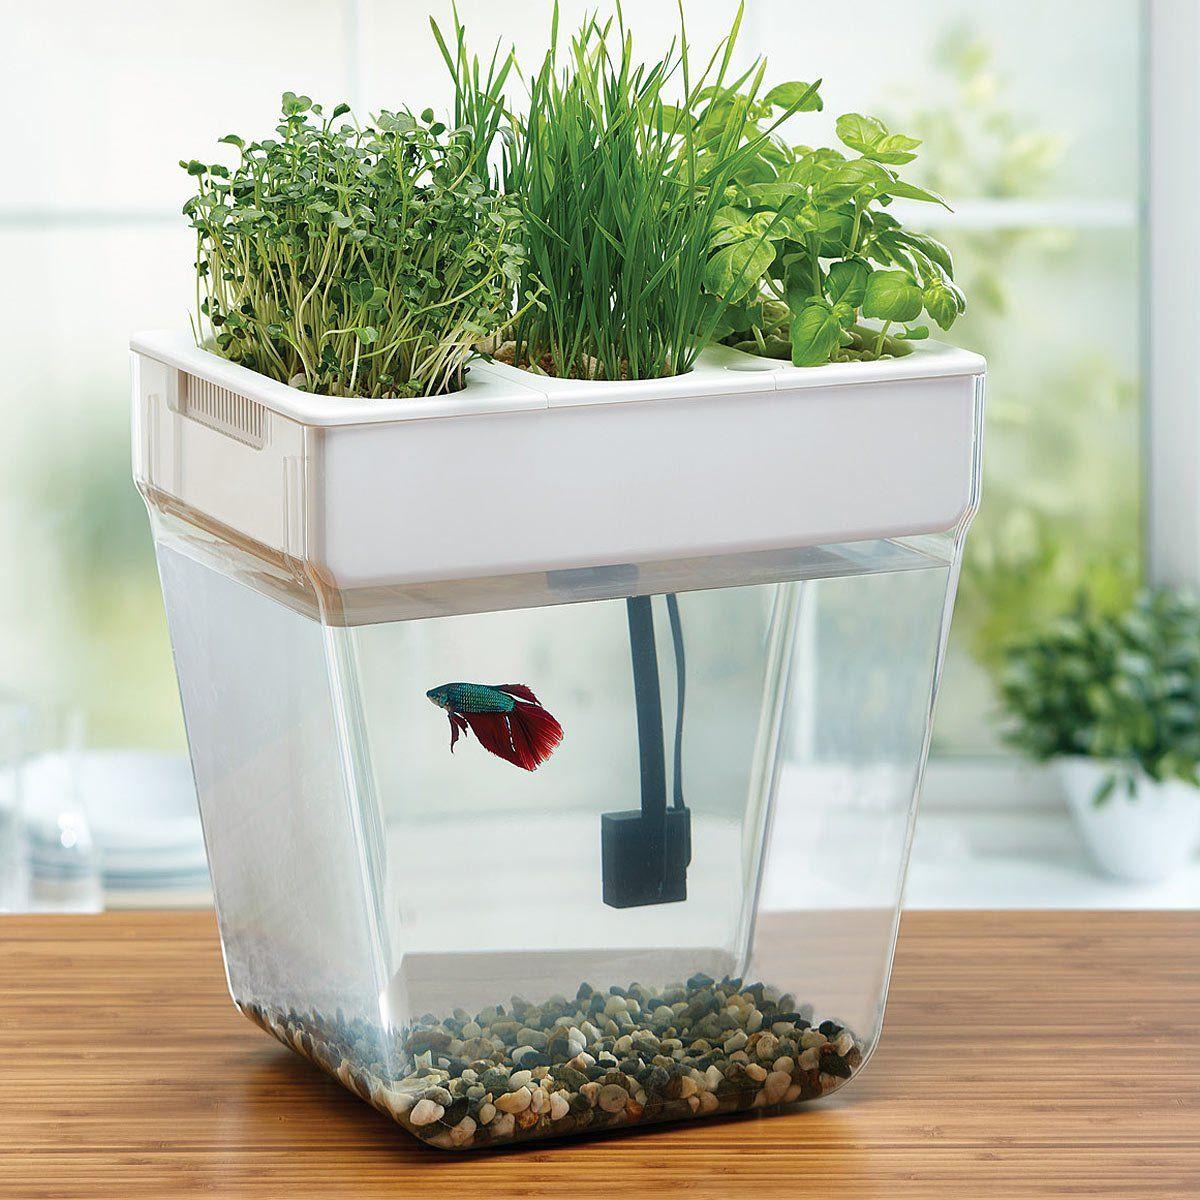 Water Garden Deluxe | Betta fish, Betta and Fish tanks